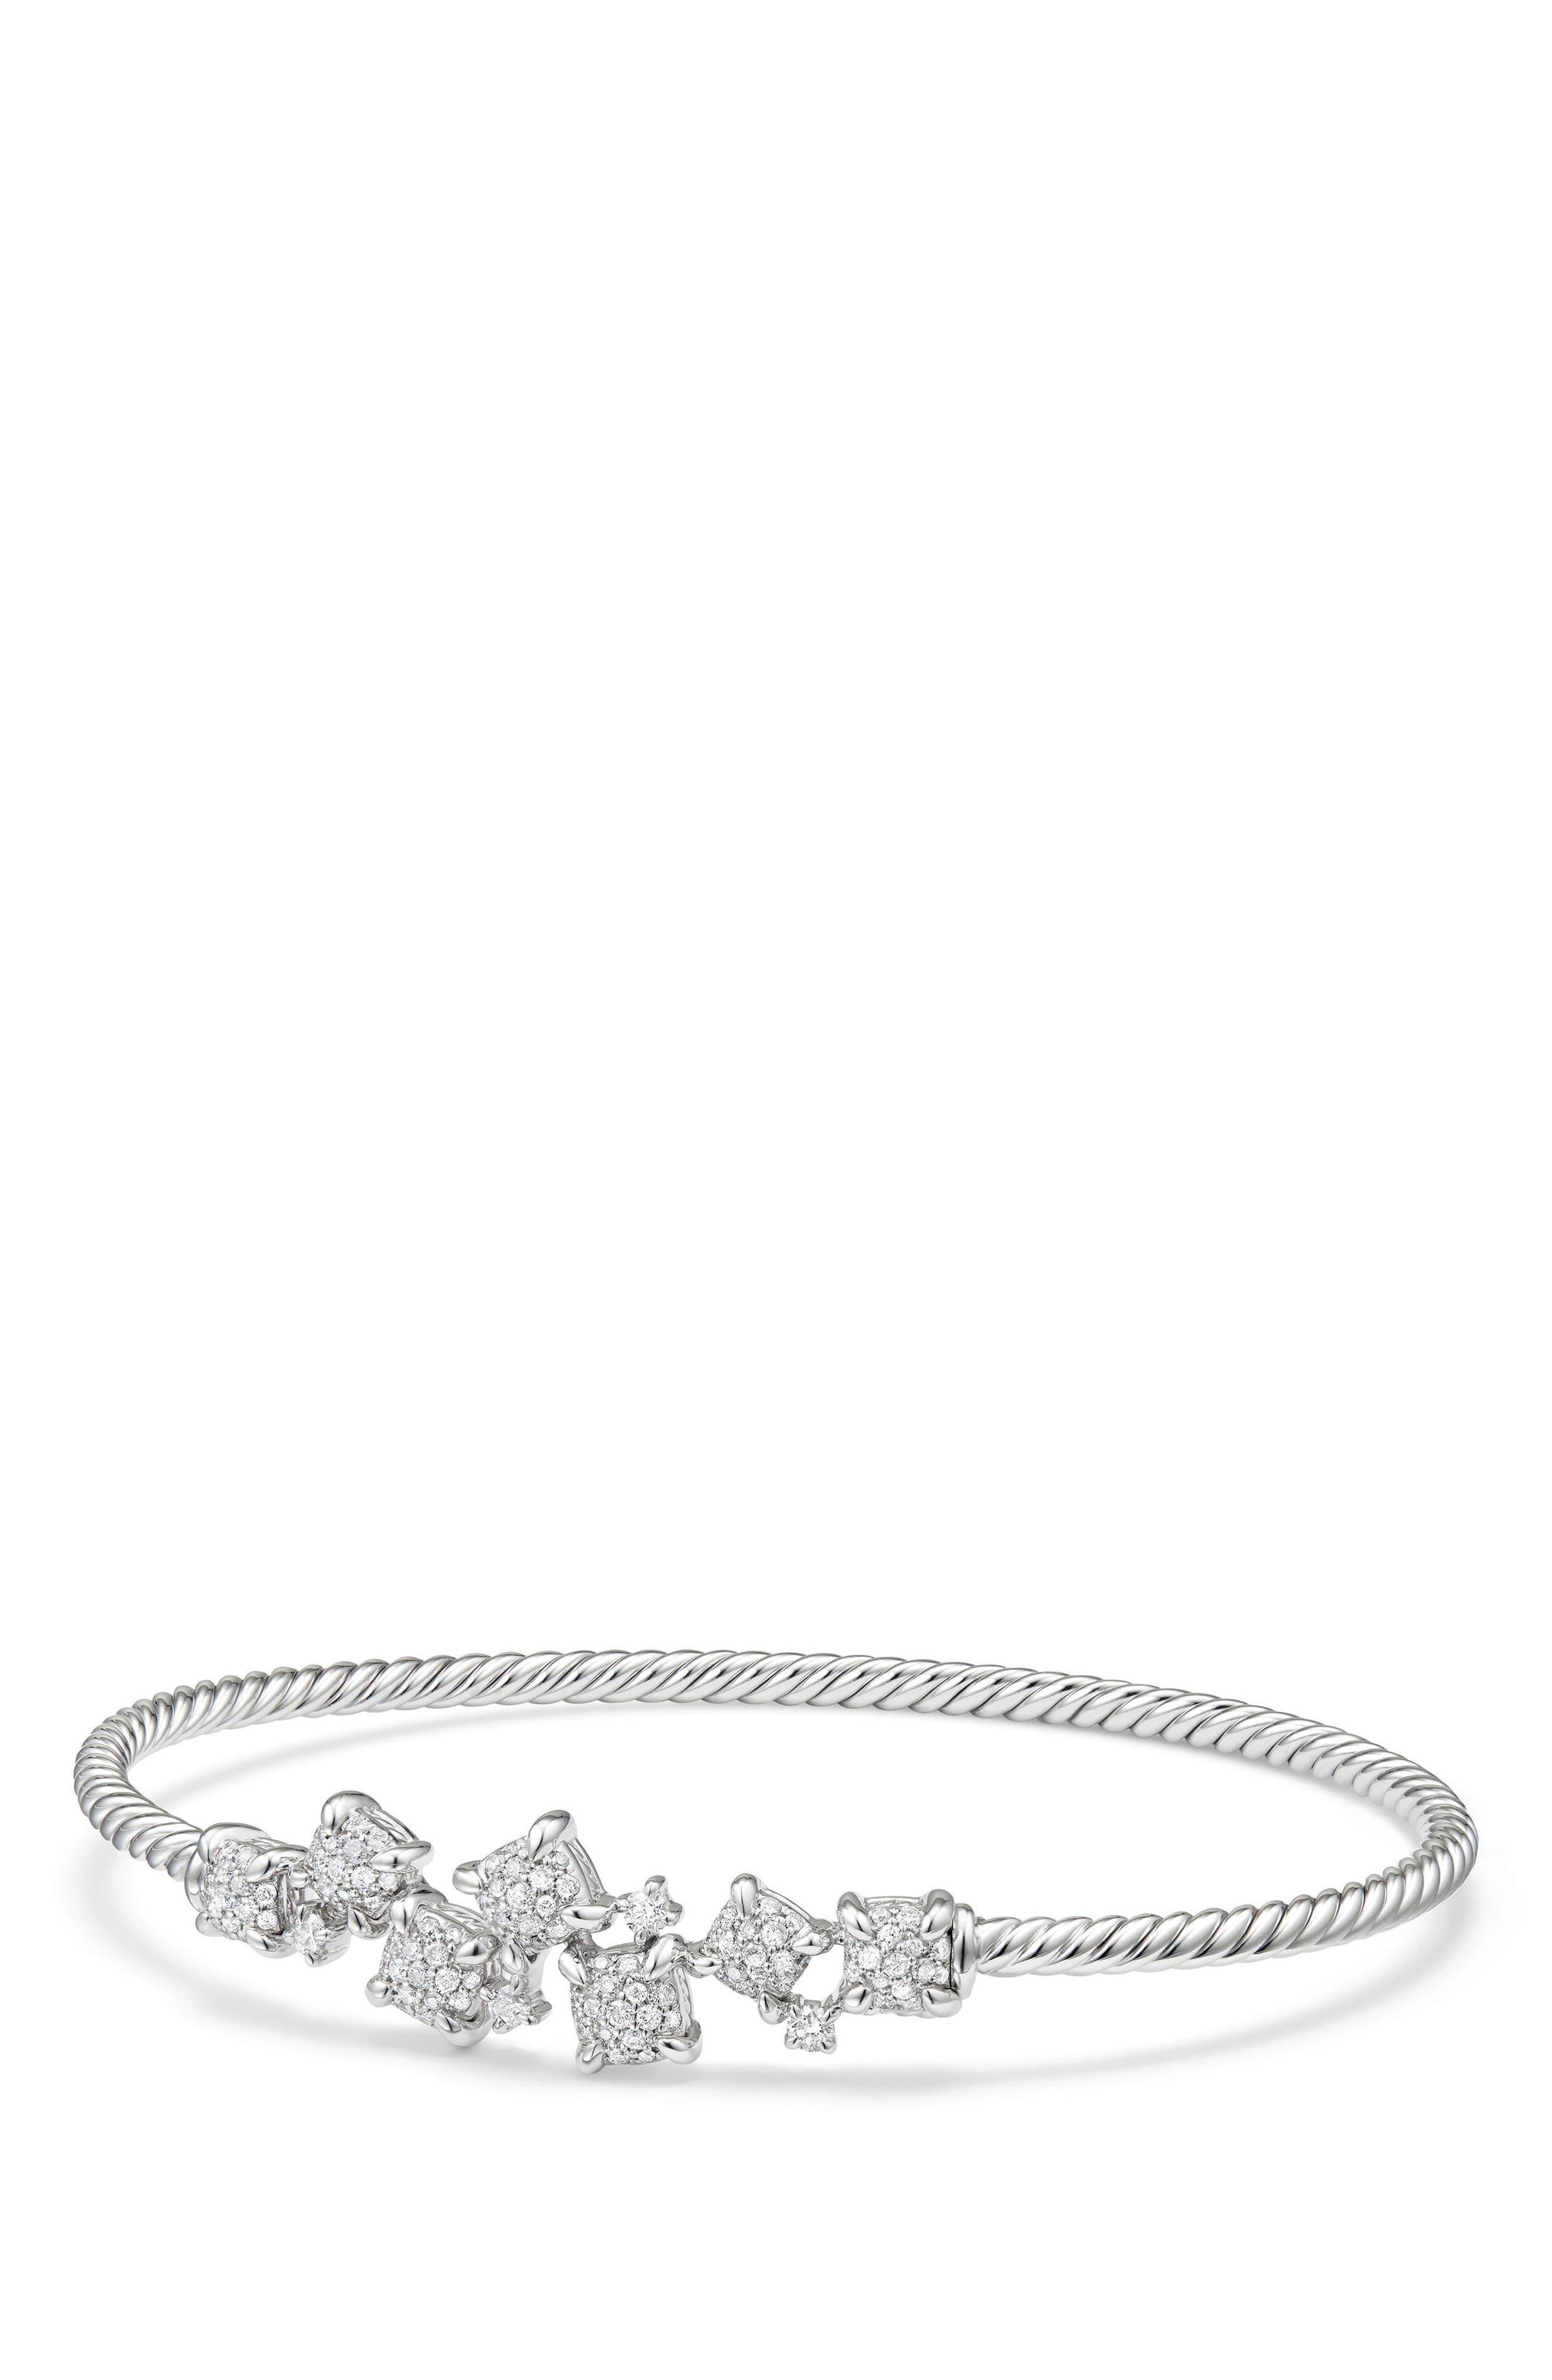 Precious Châtelaine Bracelet with Diamonds in 18K Gold,                             Main thumbnail 1, color,                             WHITE GOLD/ DIAMOND